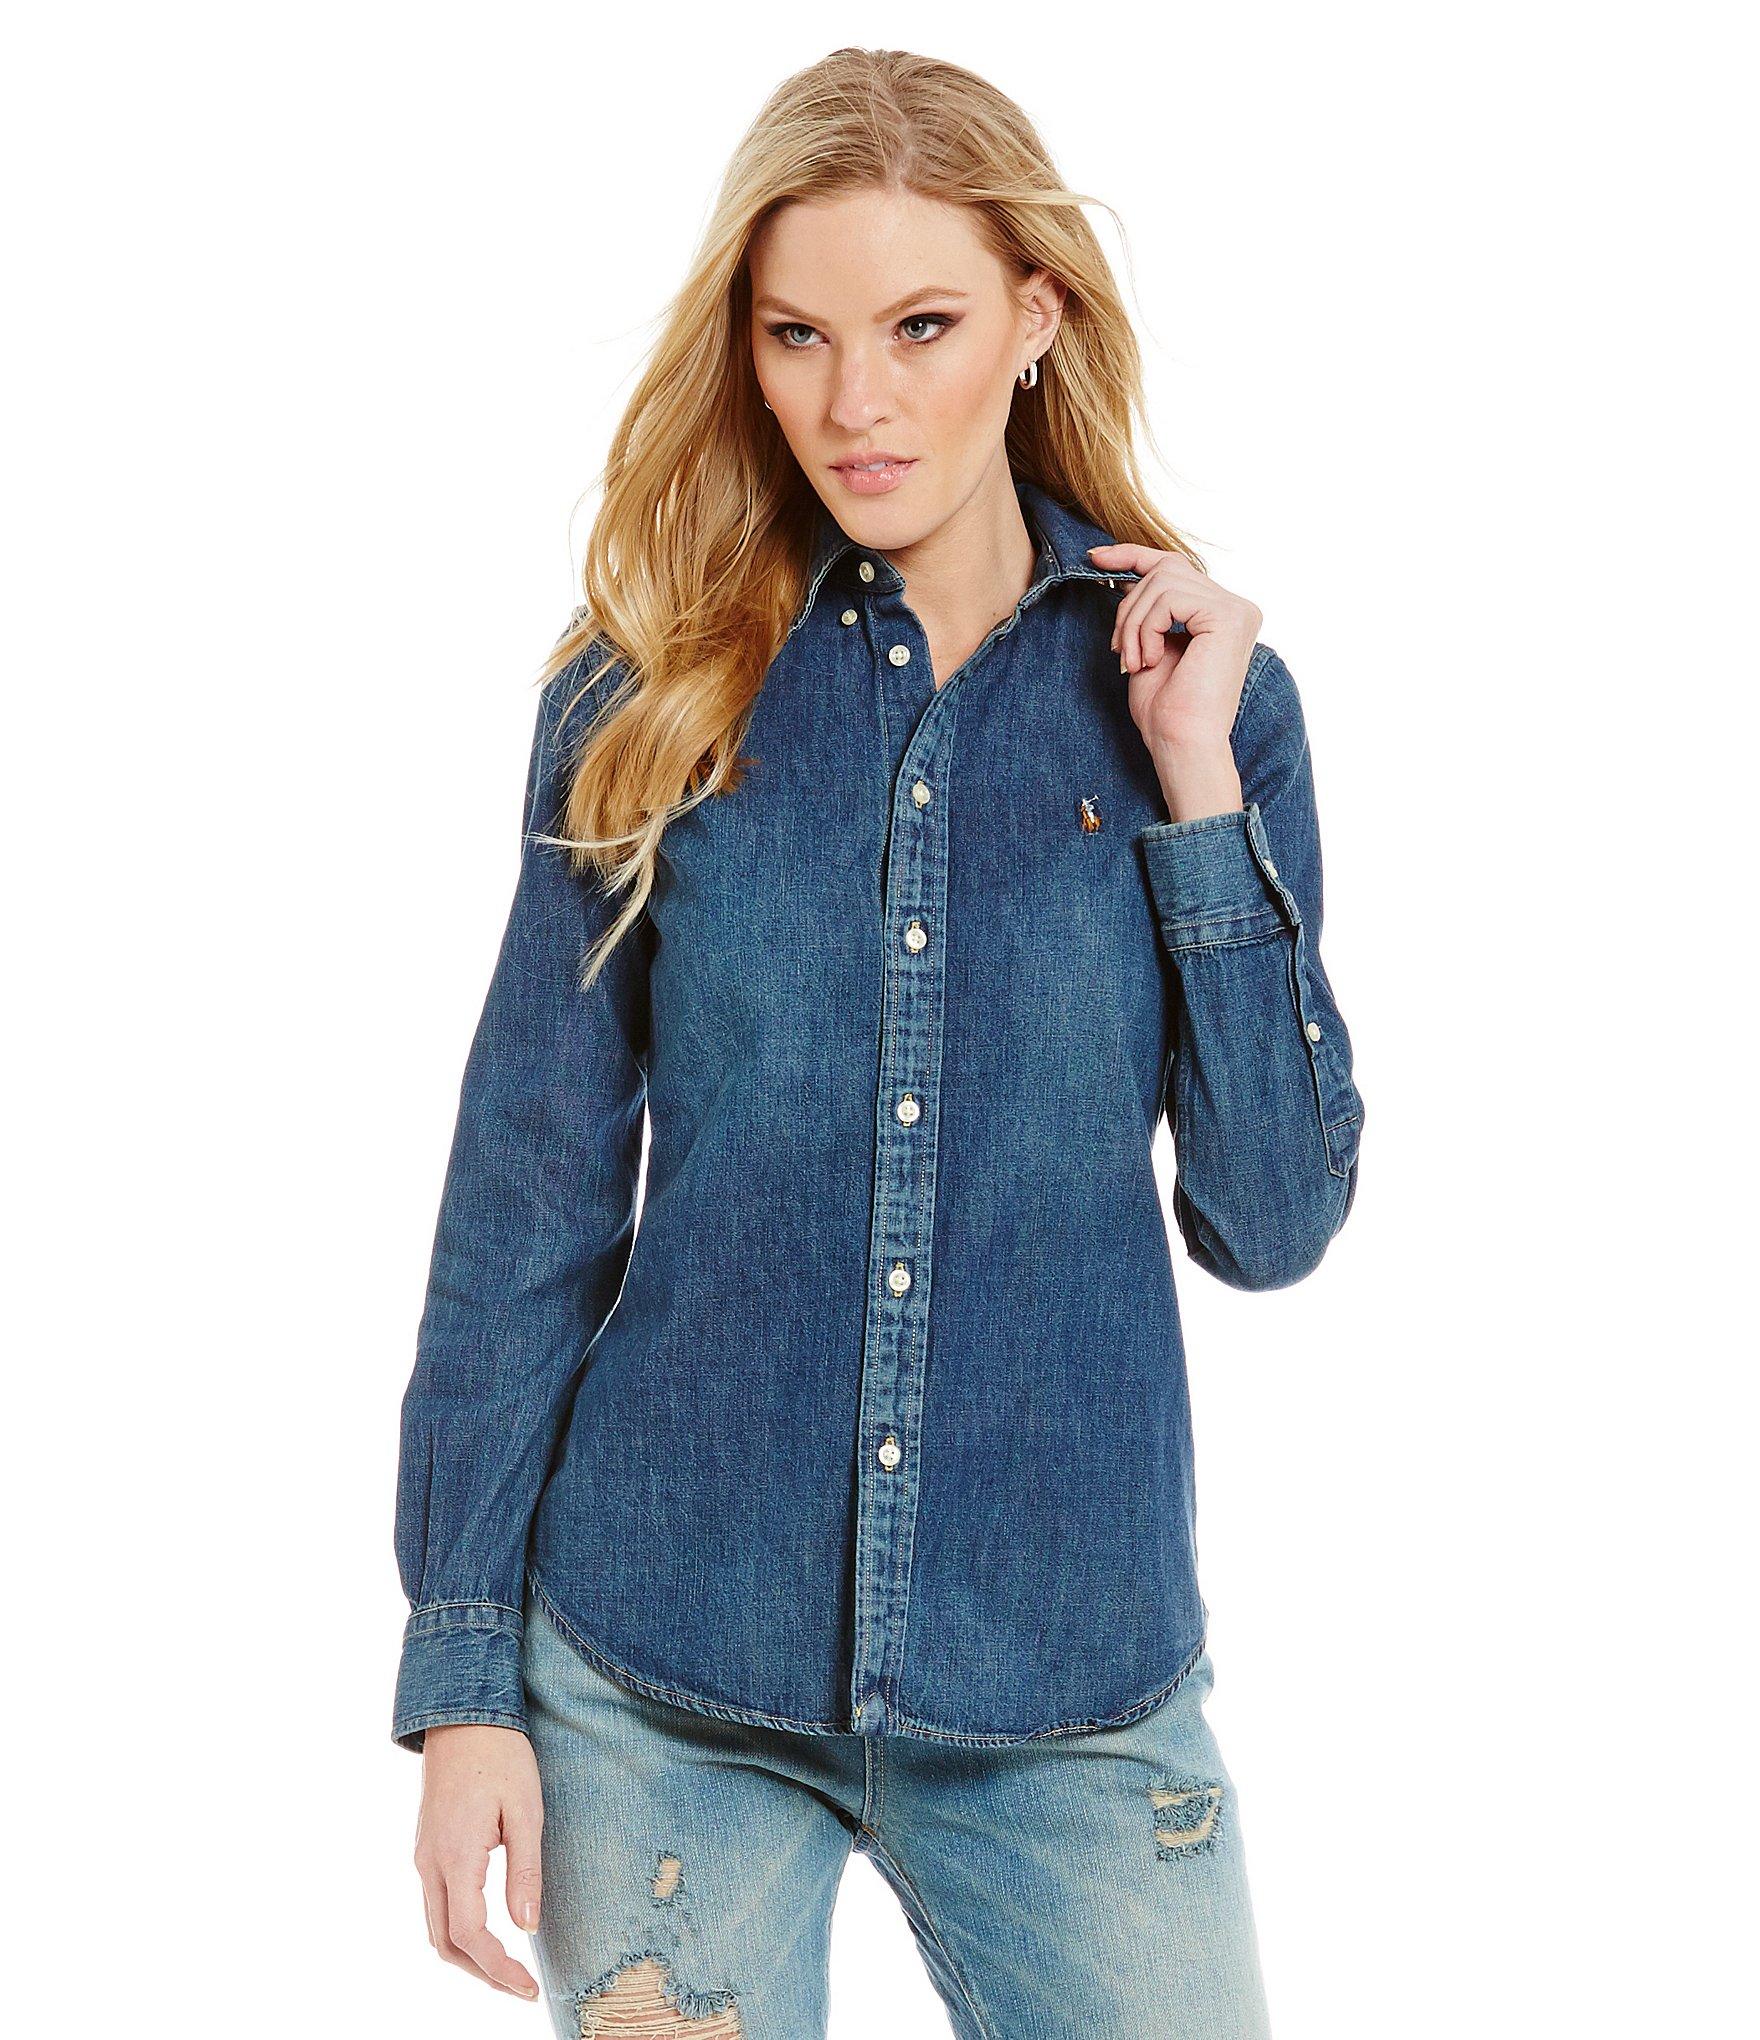 womens denim shirt: womenu0027s casual u0026 dressy tops u0026 blouses | dillards.com OQILHWC